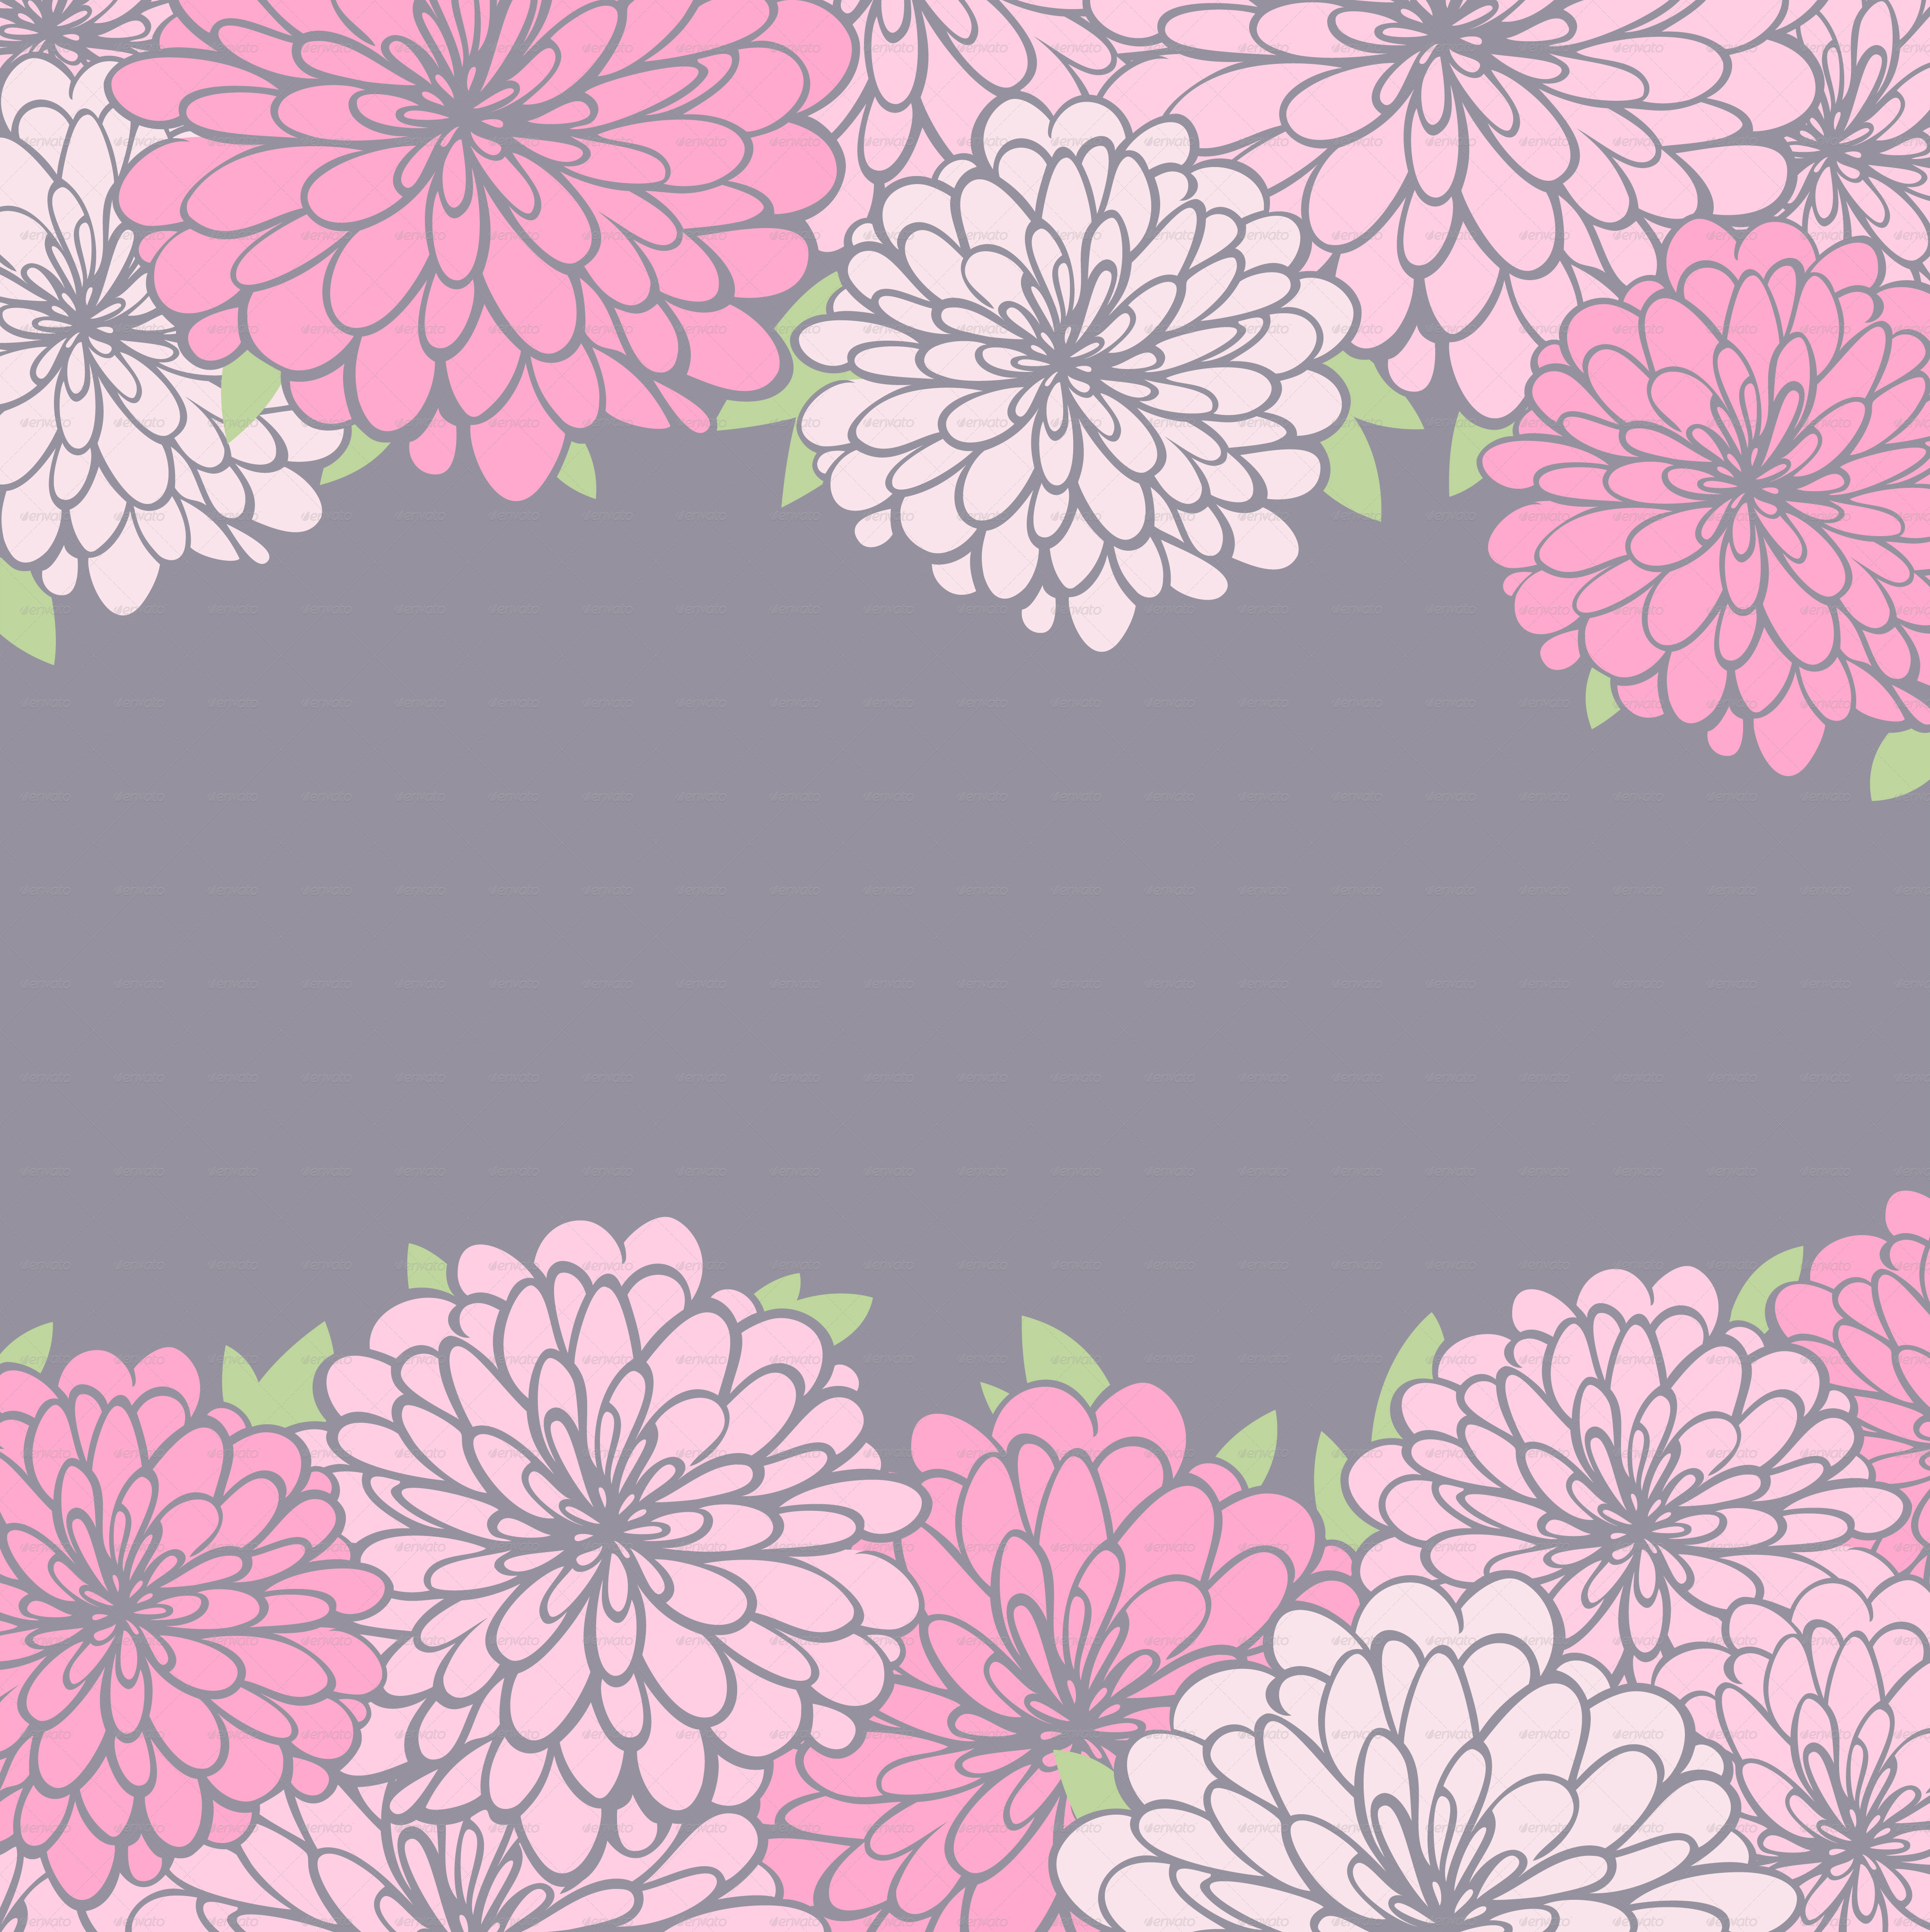 Pink floral seamless vector background floral hrysanthemum seamless - Floral Background And Seamless Pattern Backgrounds Decorative Background_fl Jpg